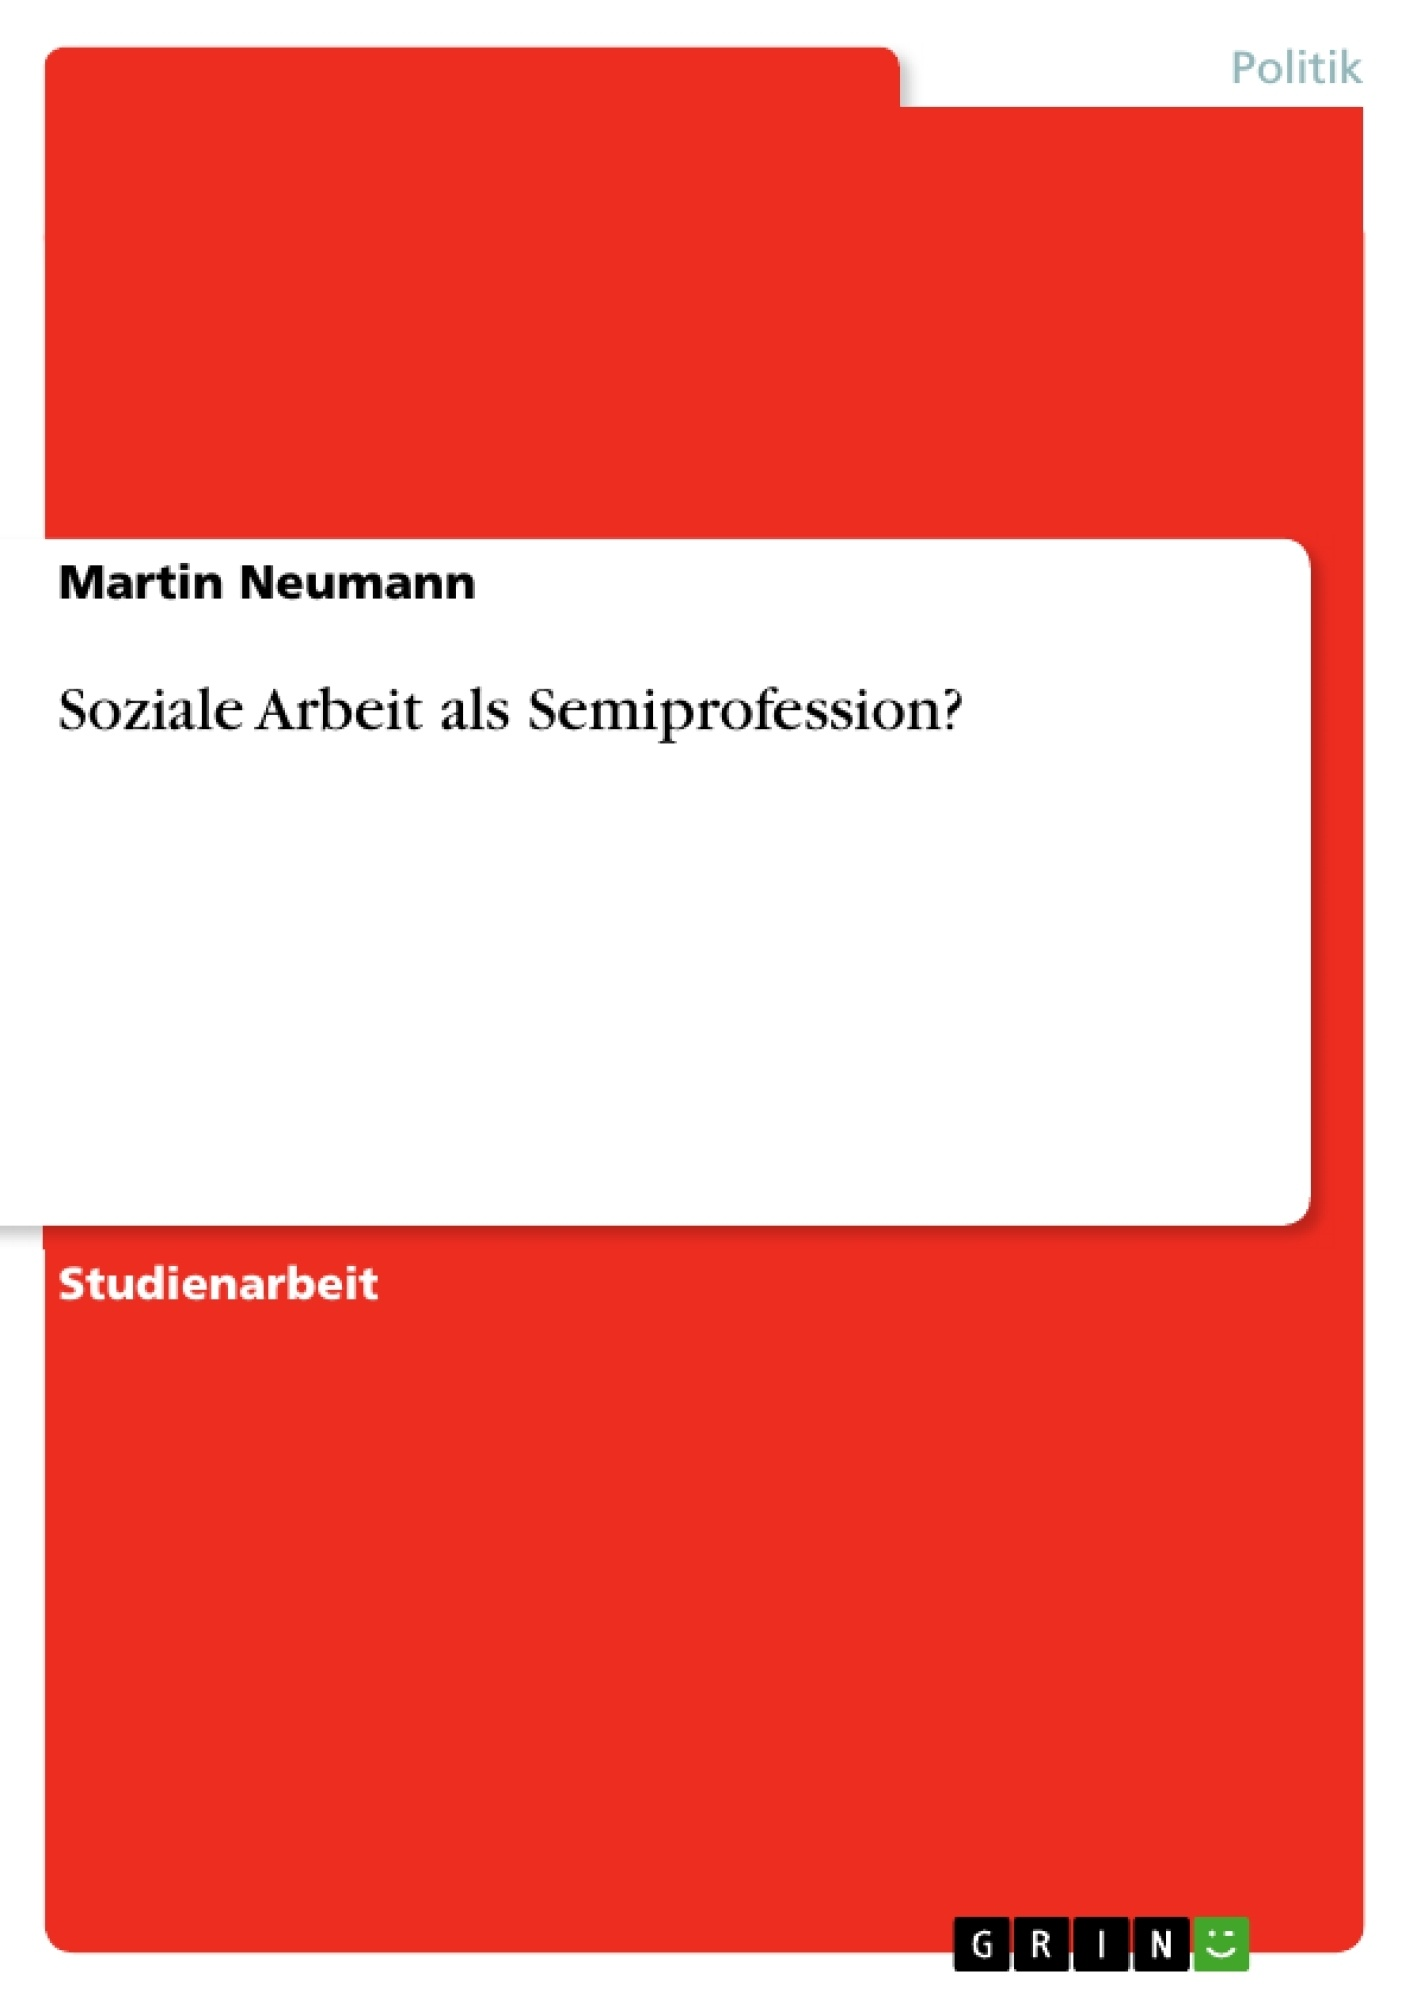 Titel: Soziale Arbeit als Semiprofession?